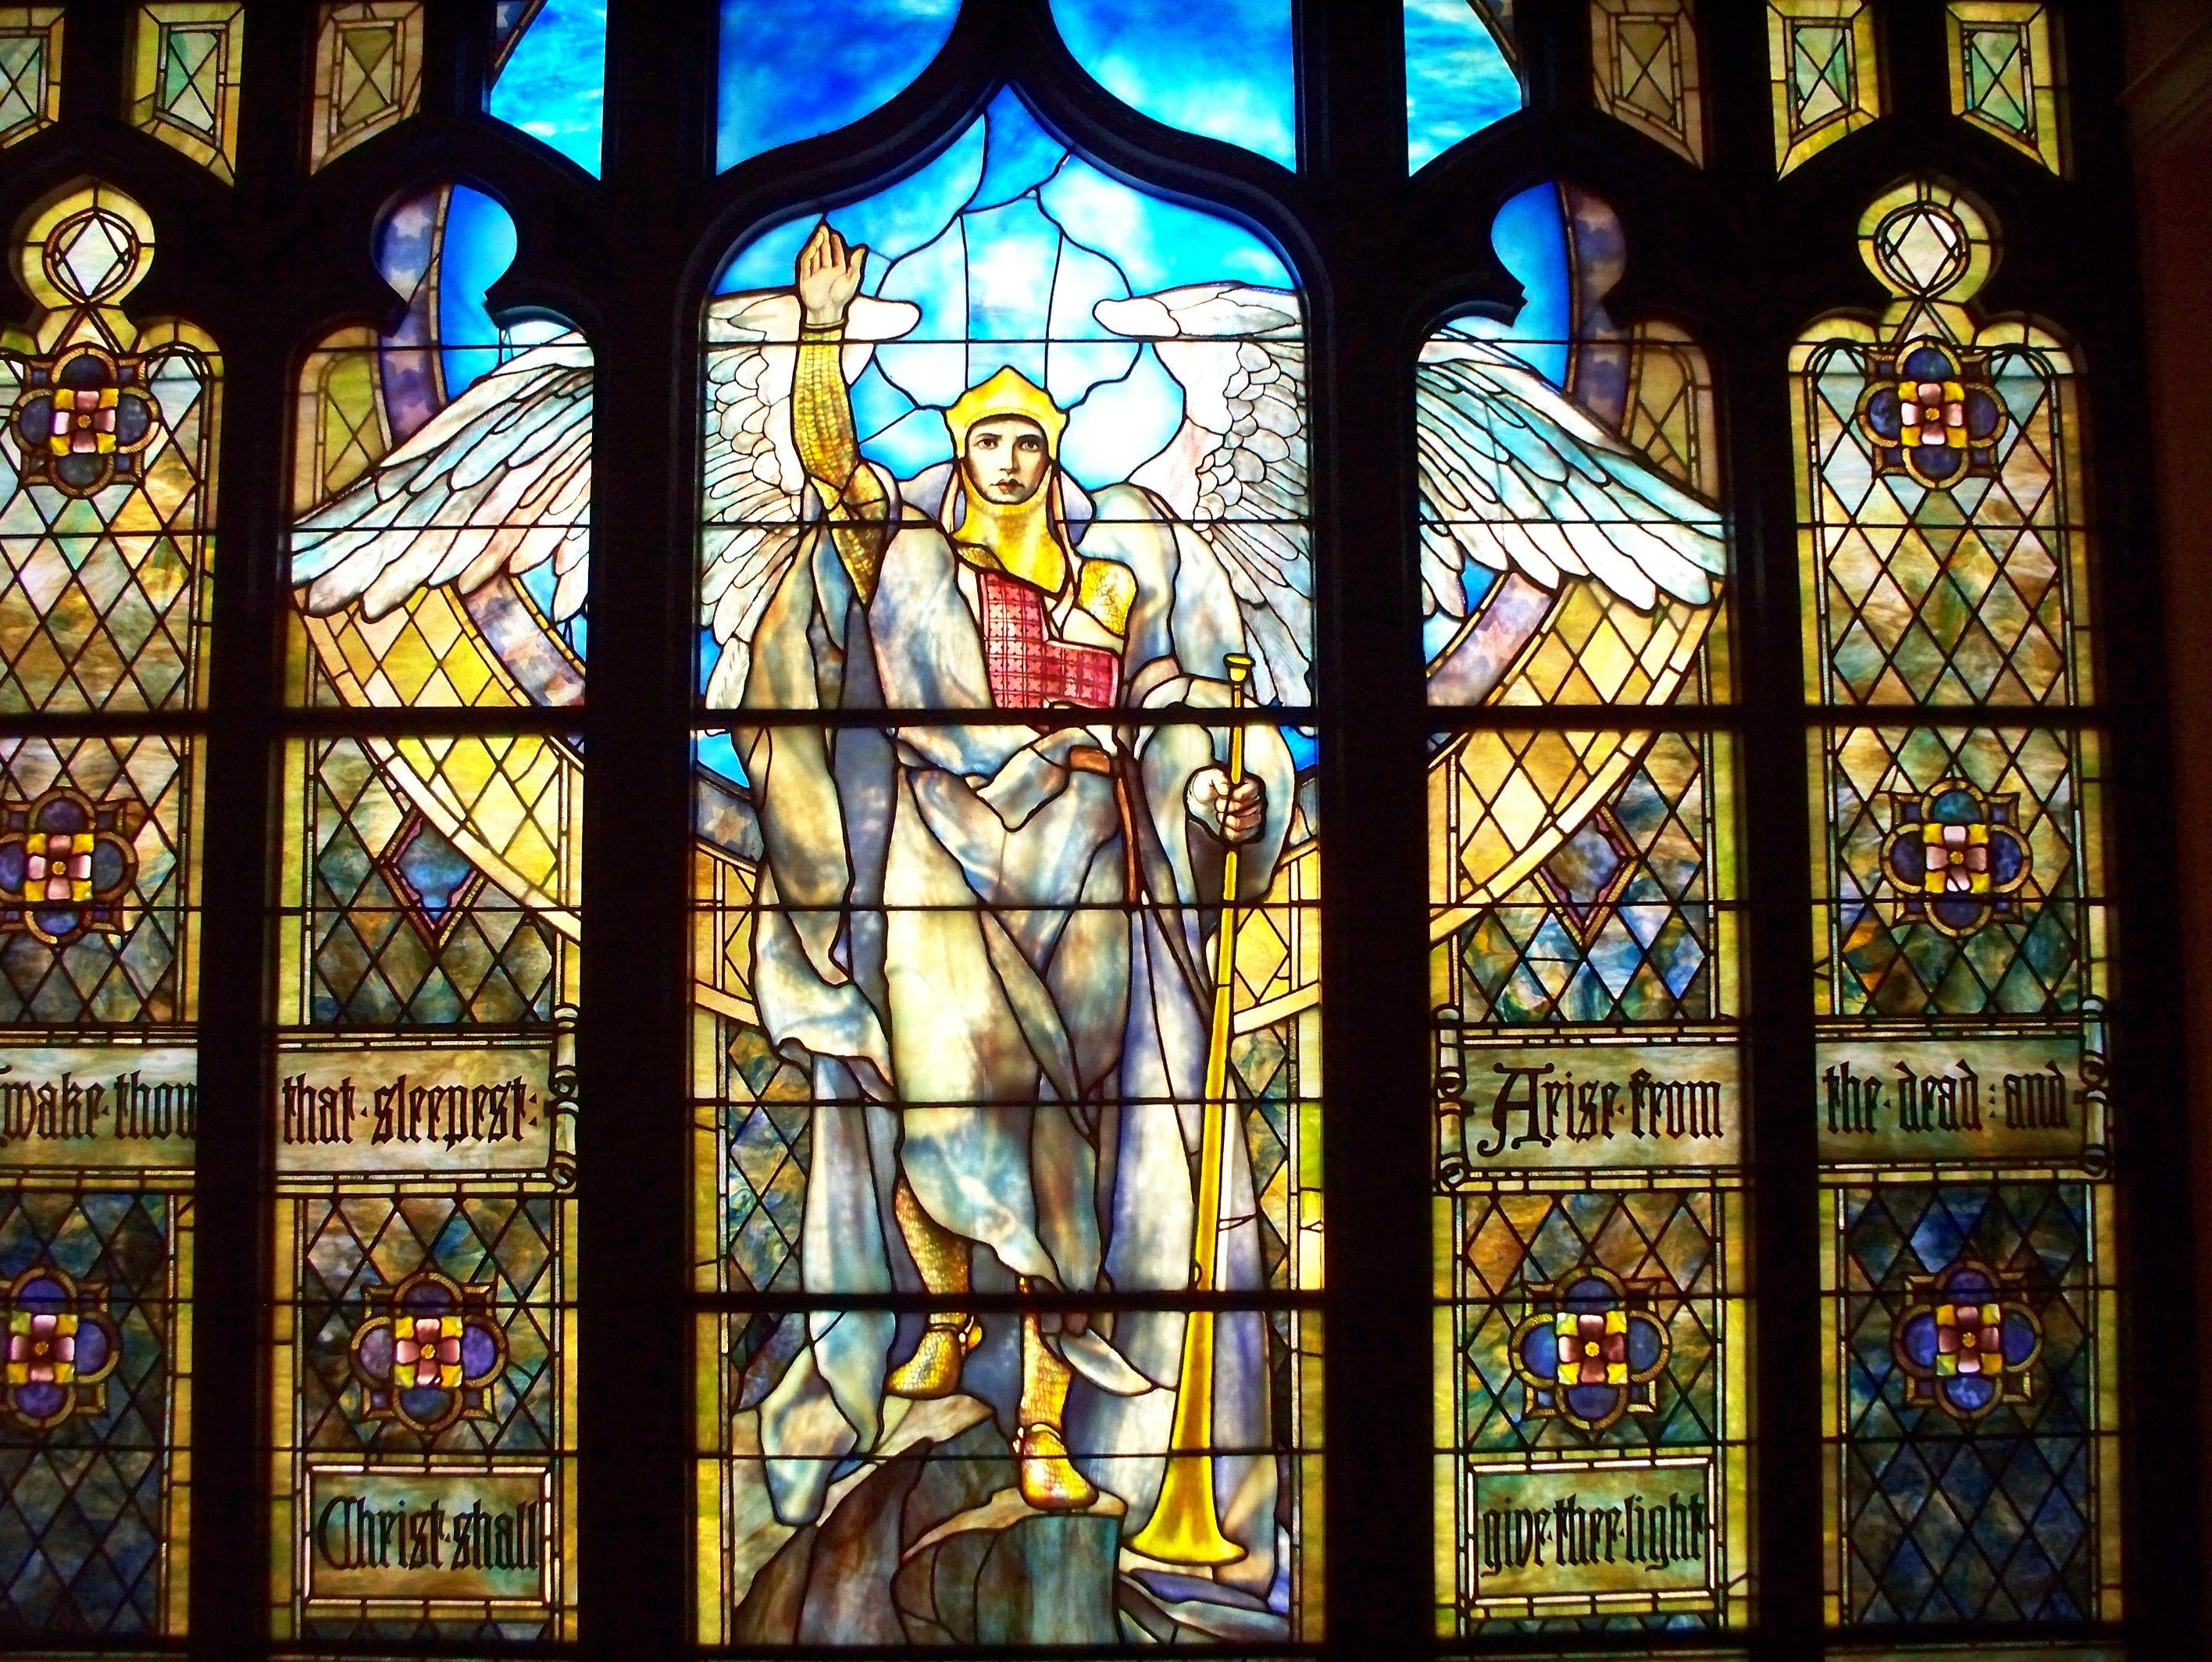 trinity episcopal church galveston stained glass windows google